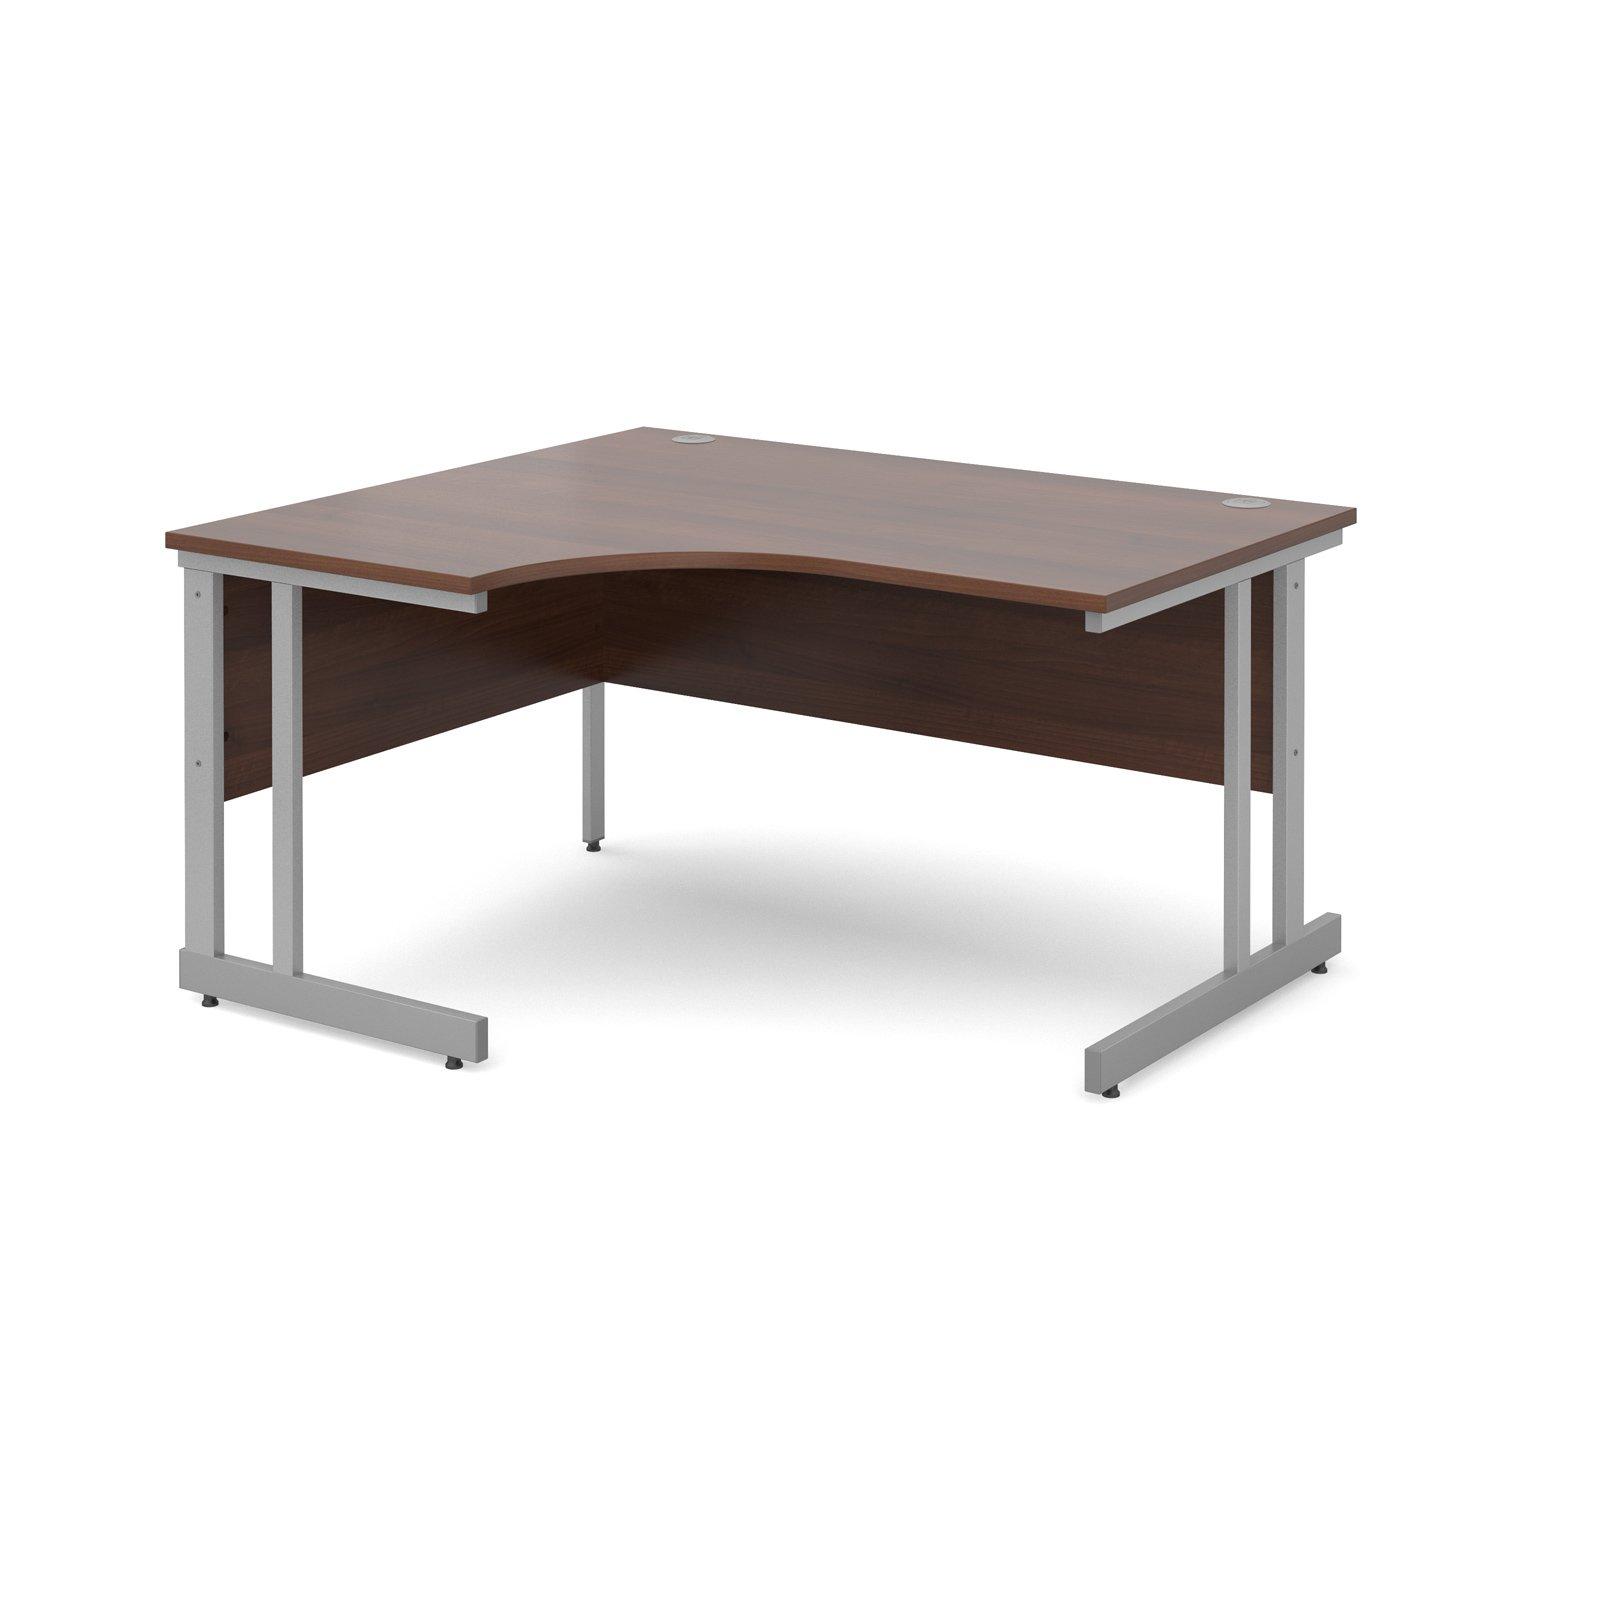 Momento left hand ergonomic desk 1400mm - silver cantilever frame, walnut top